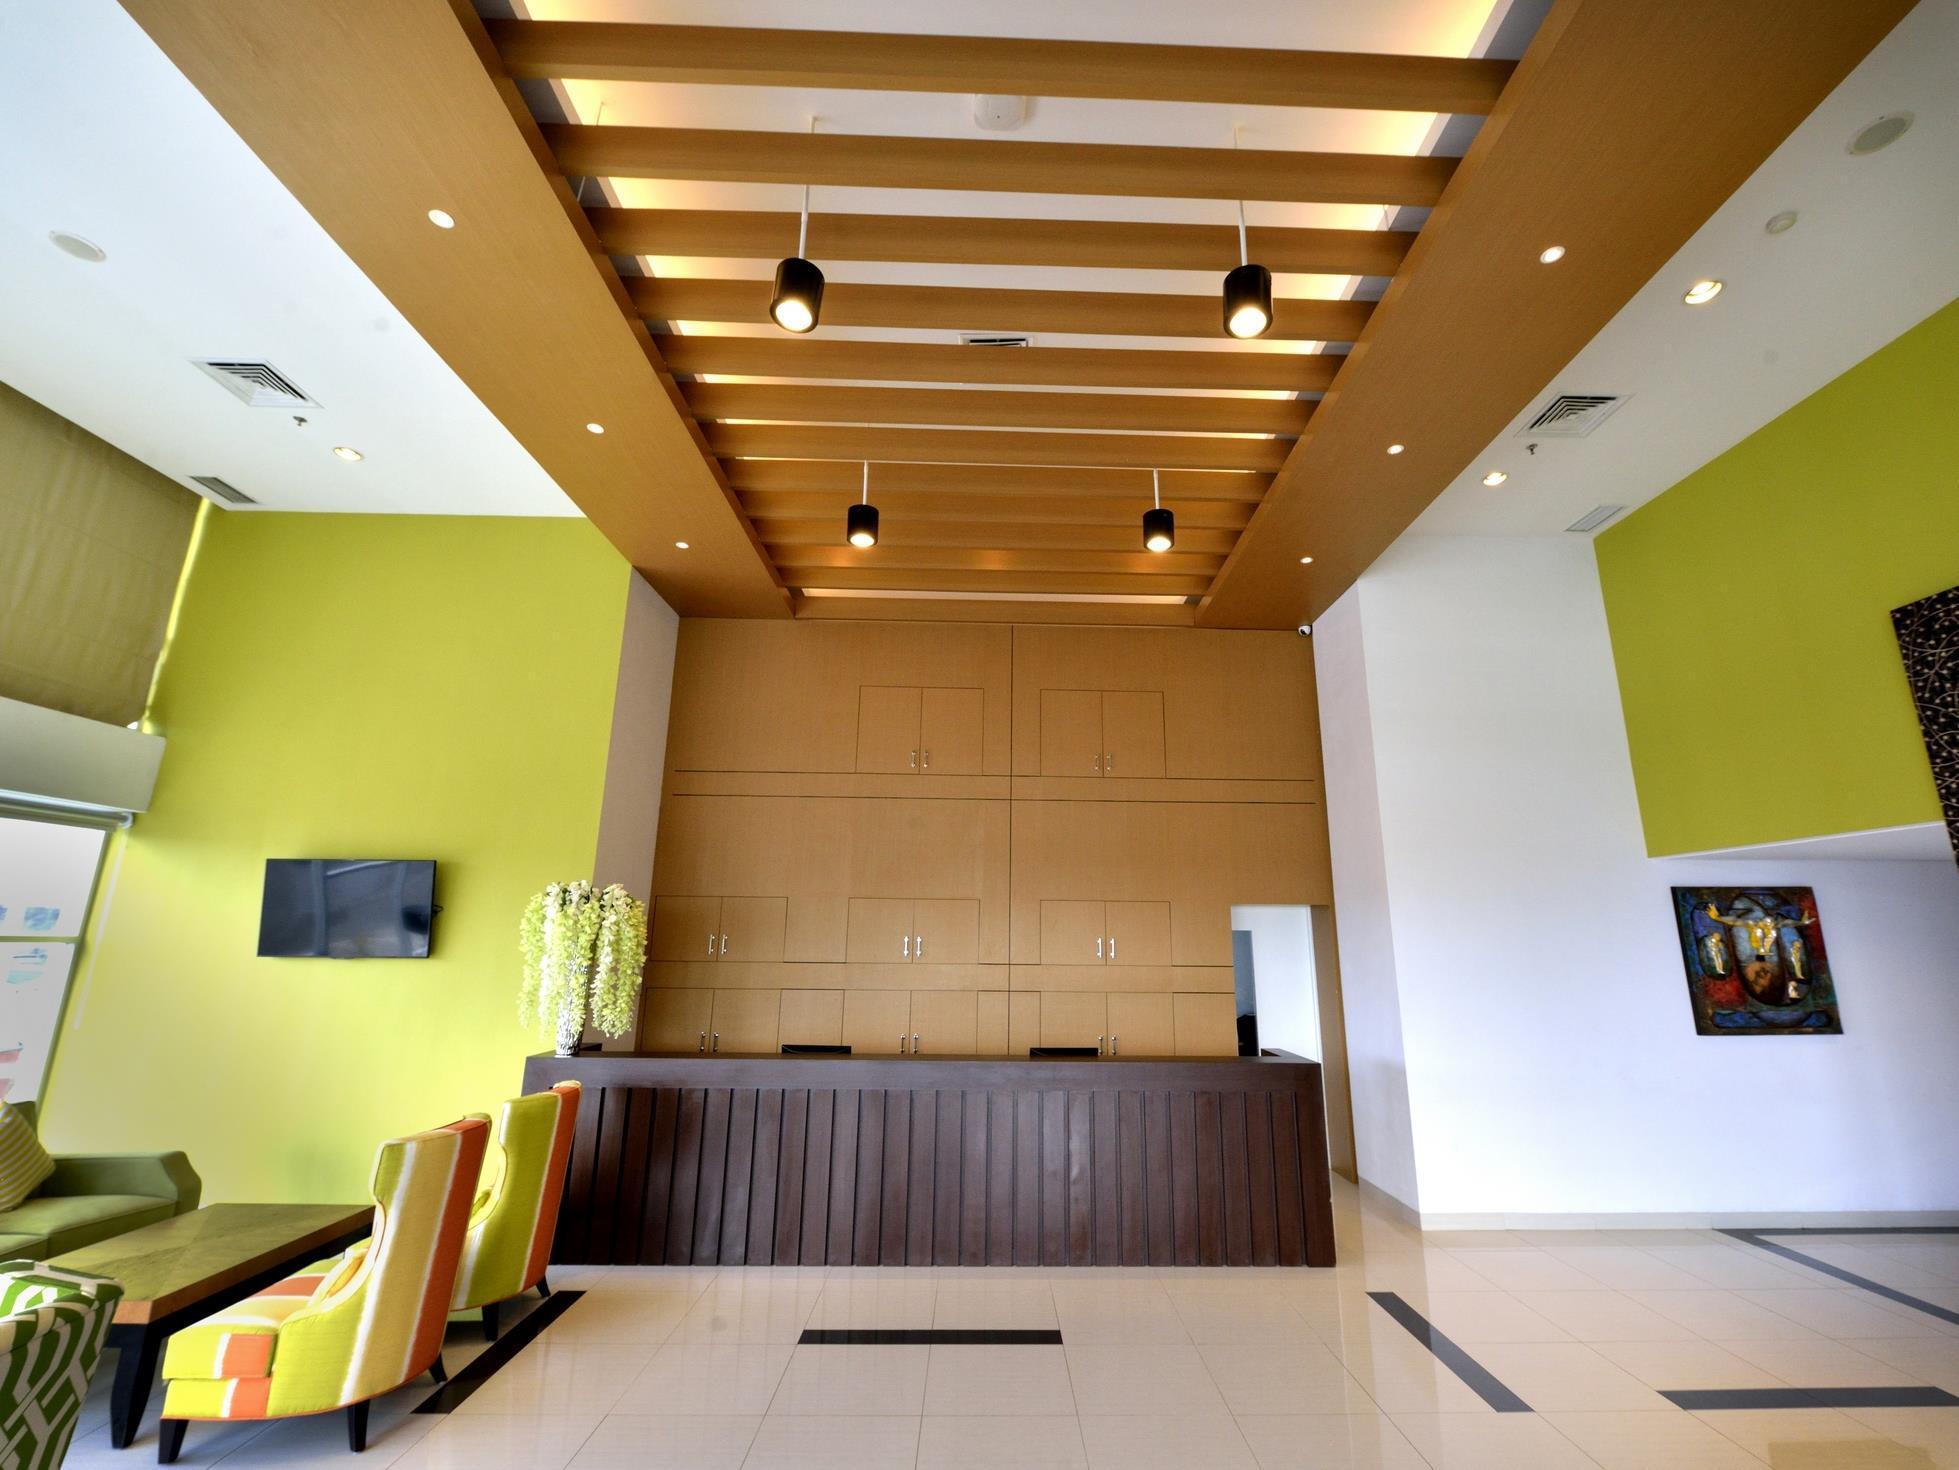 Whiz Prime Hotel Megamas Manado - Promo Harga